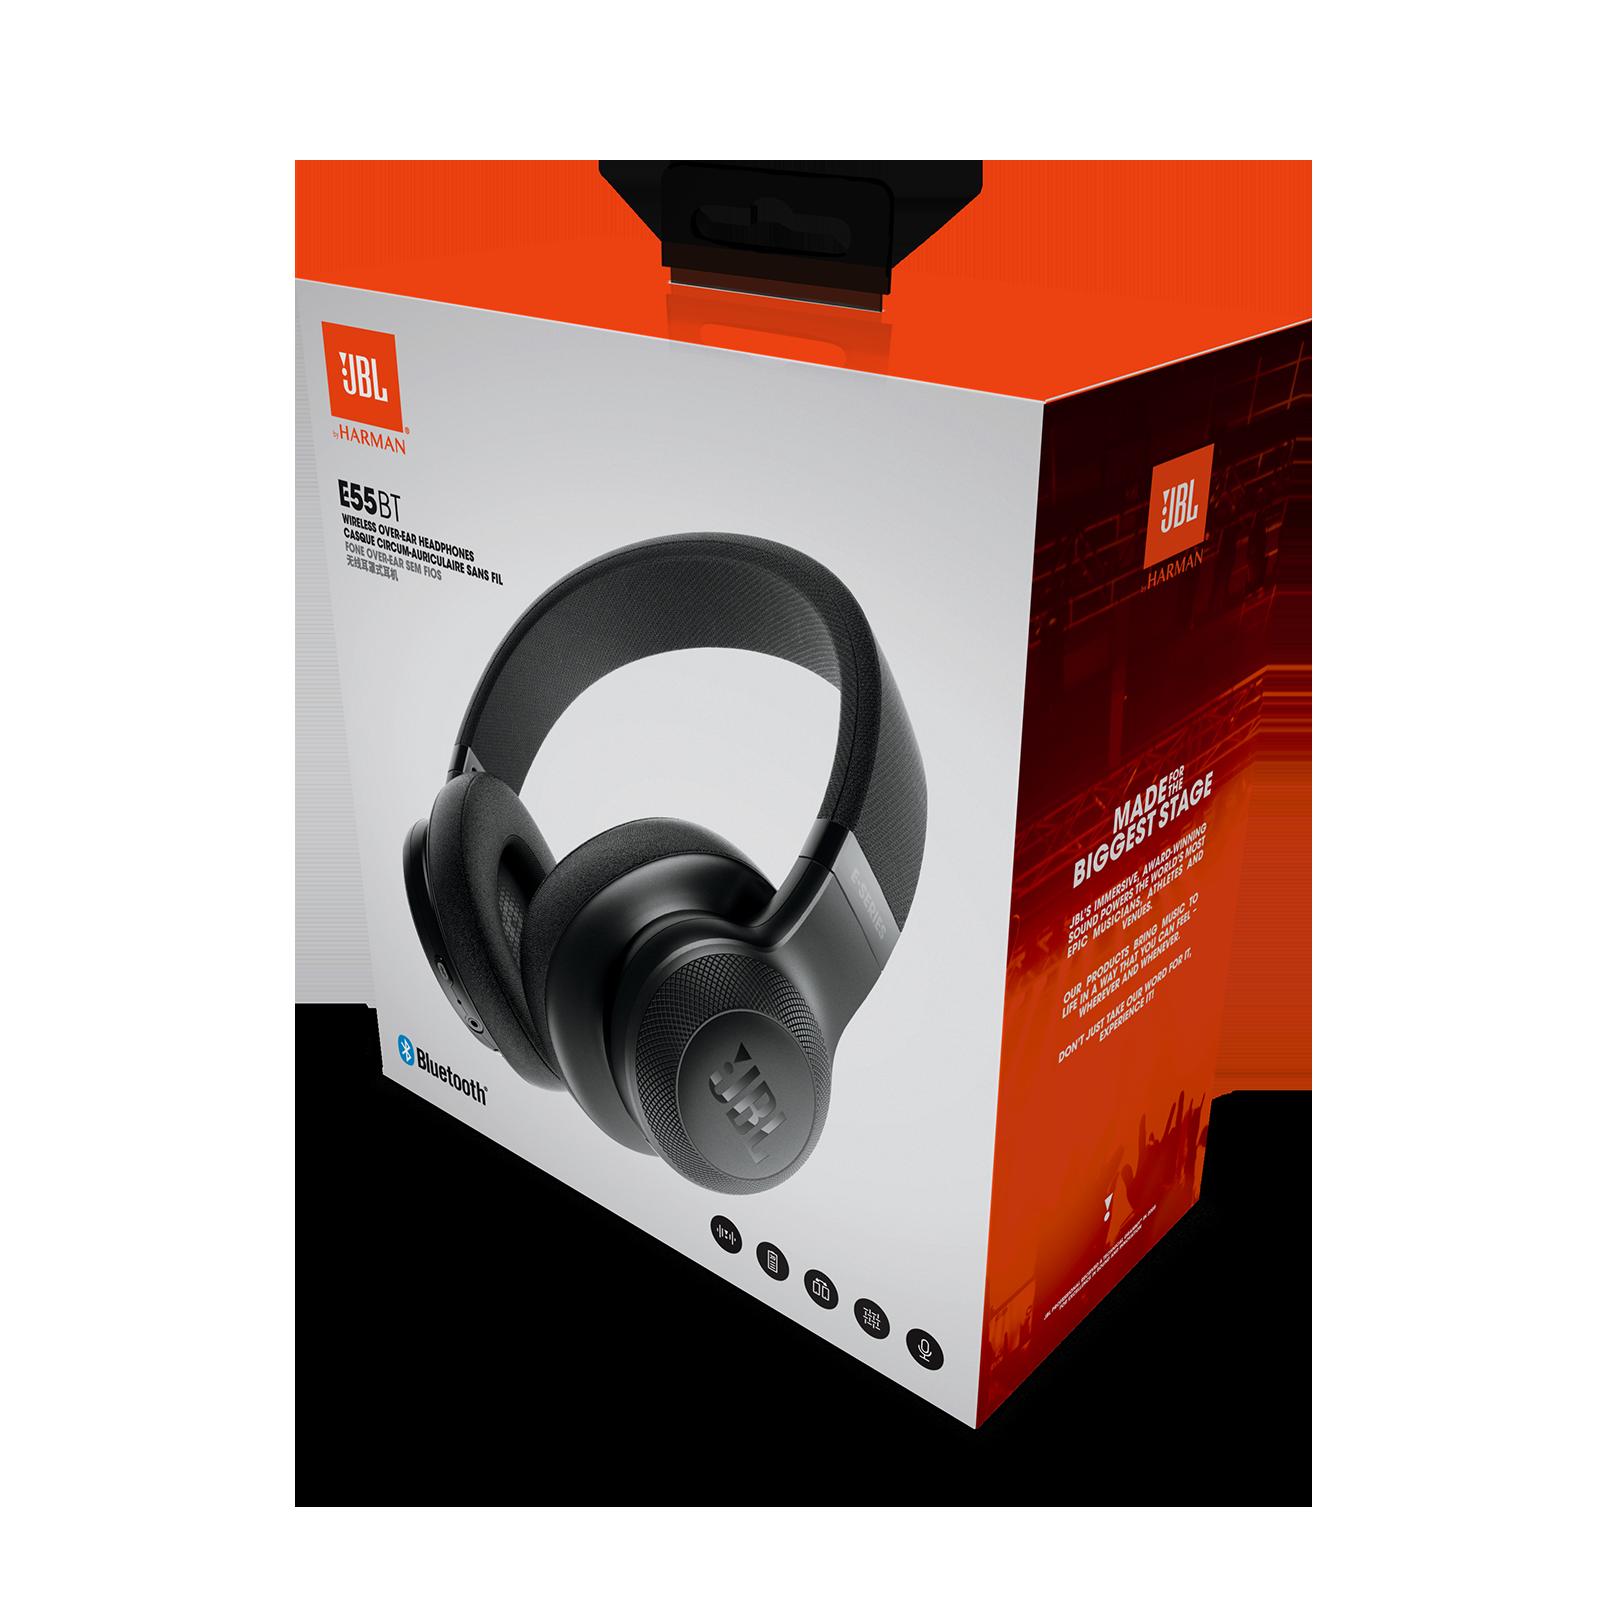 jbl e55bt wireless over ear headphones. Black Bedroom Furniture Sets. Home Design Ideas